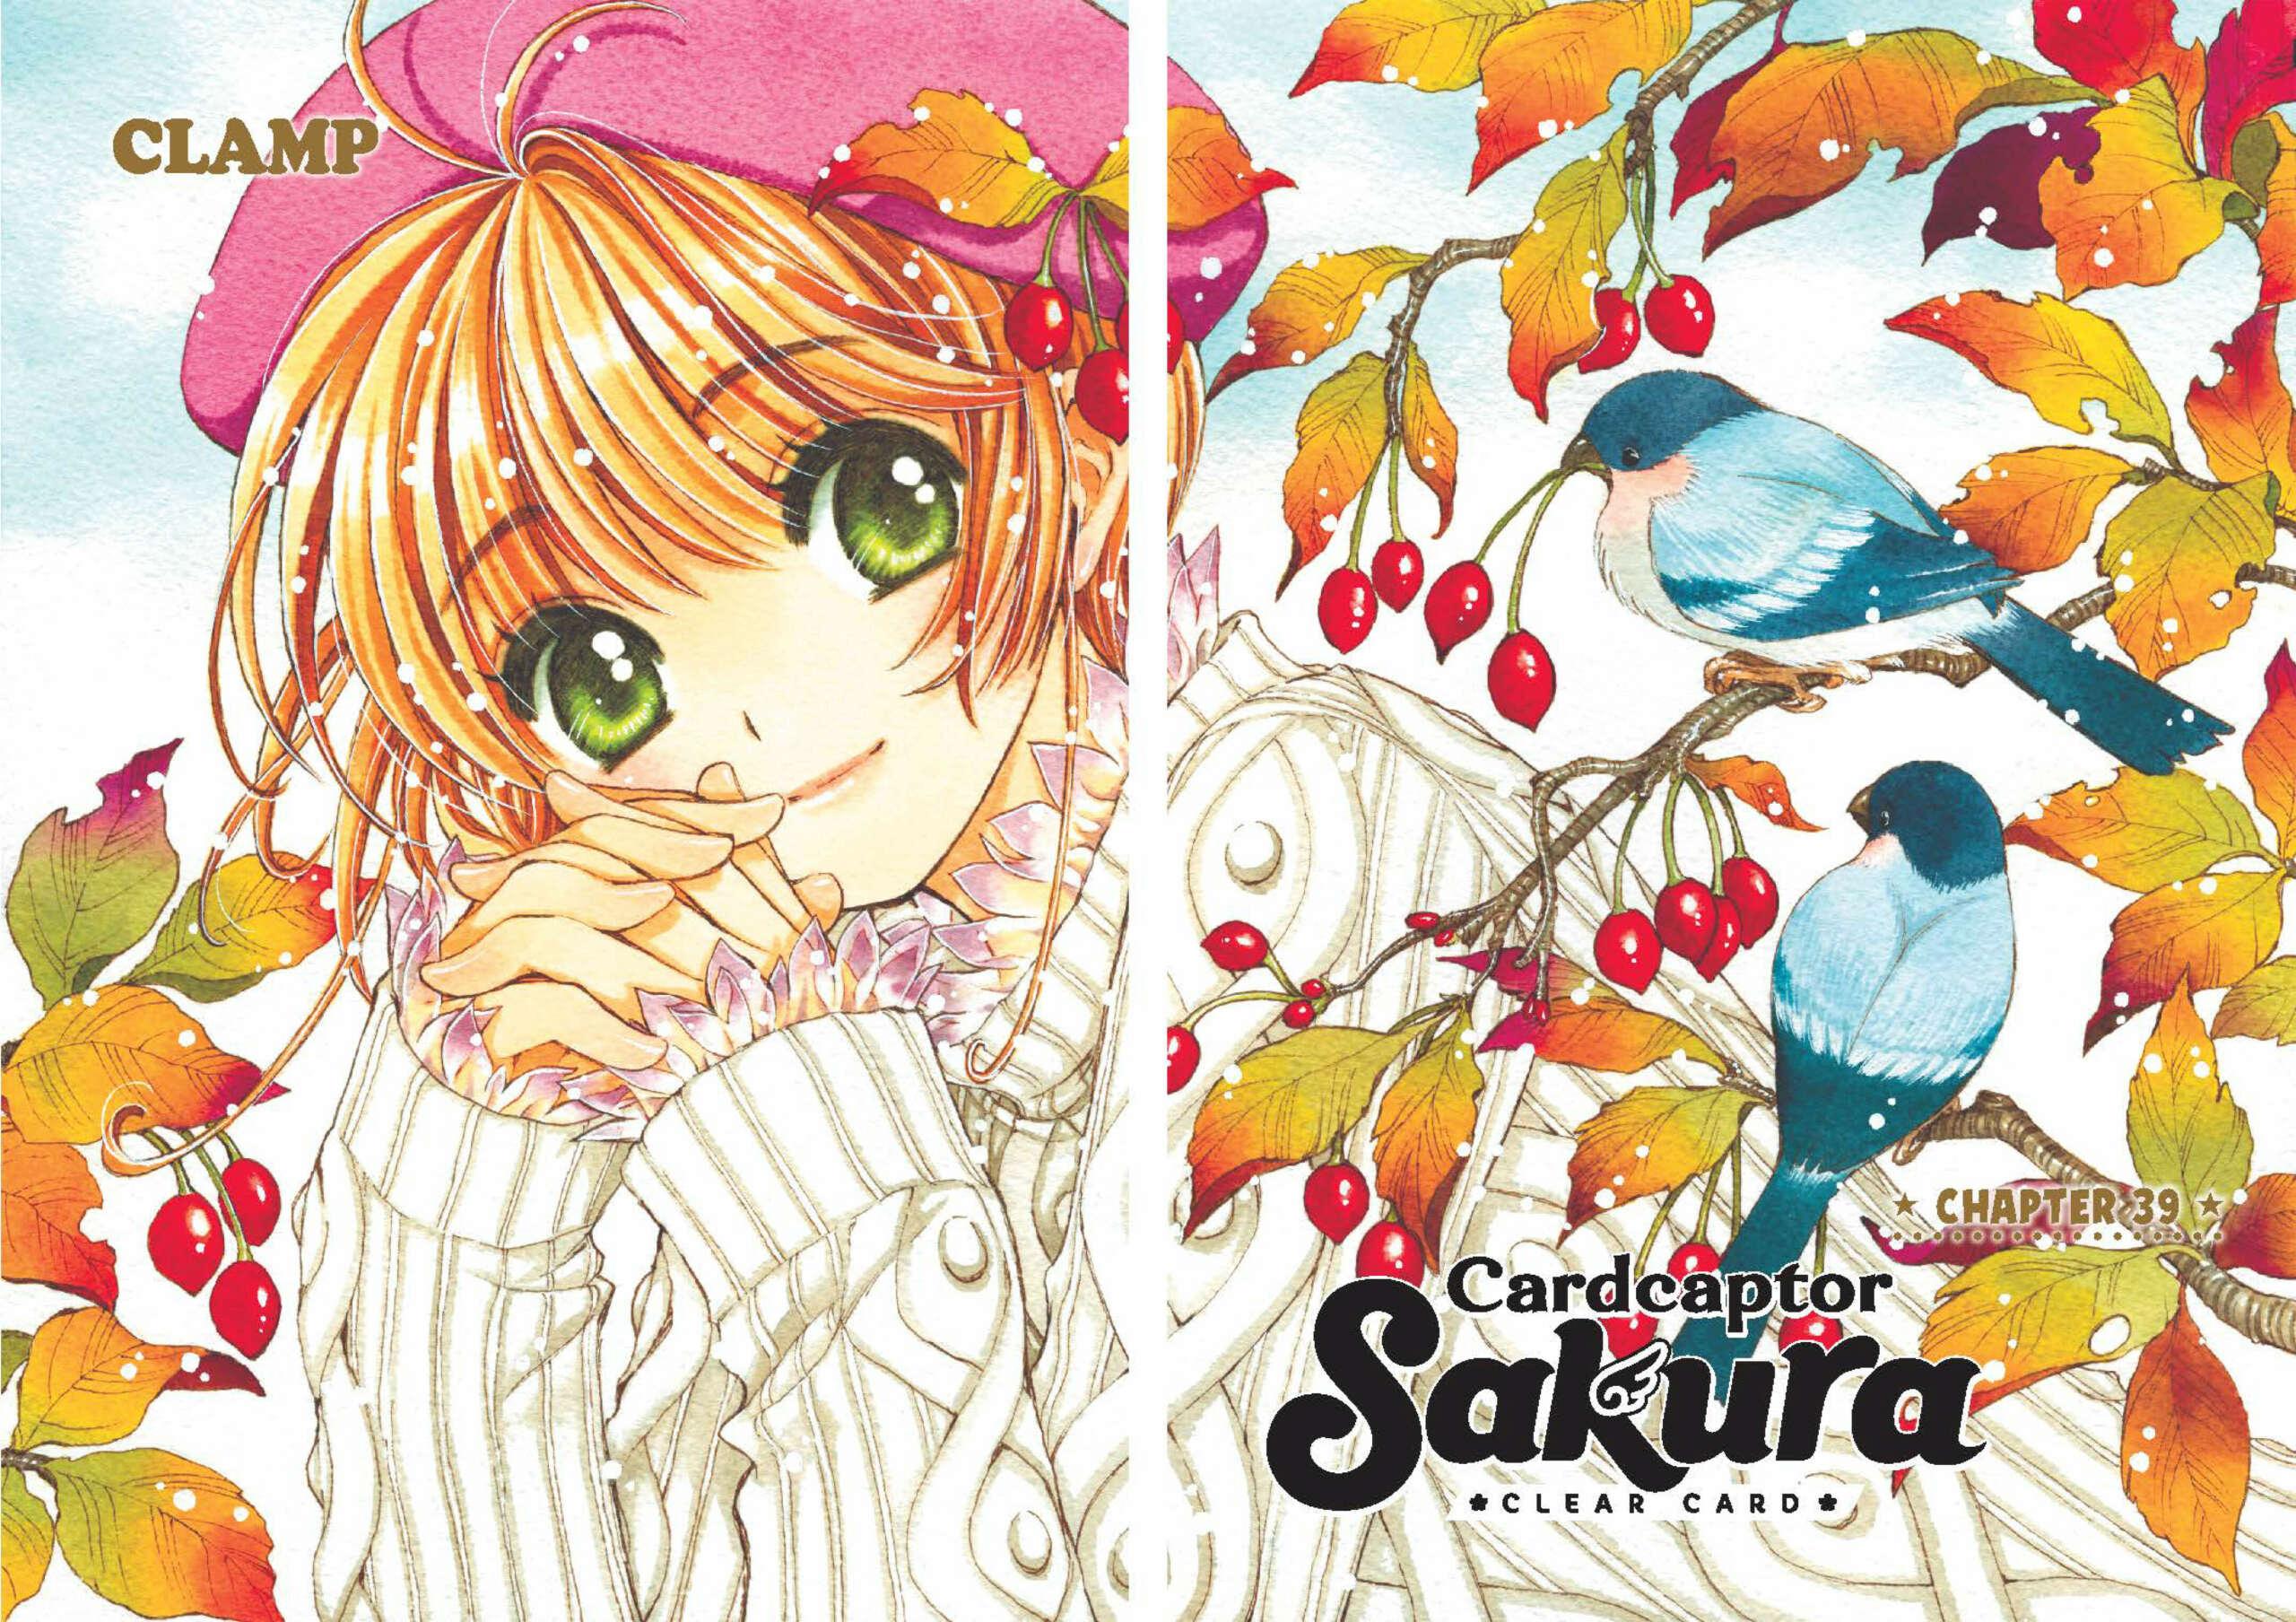 Card Captor Sakura et autres mangas [CLAMP] - Page 41 0012410